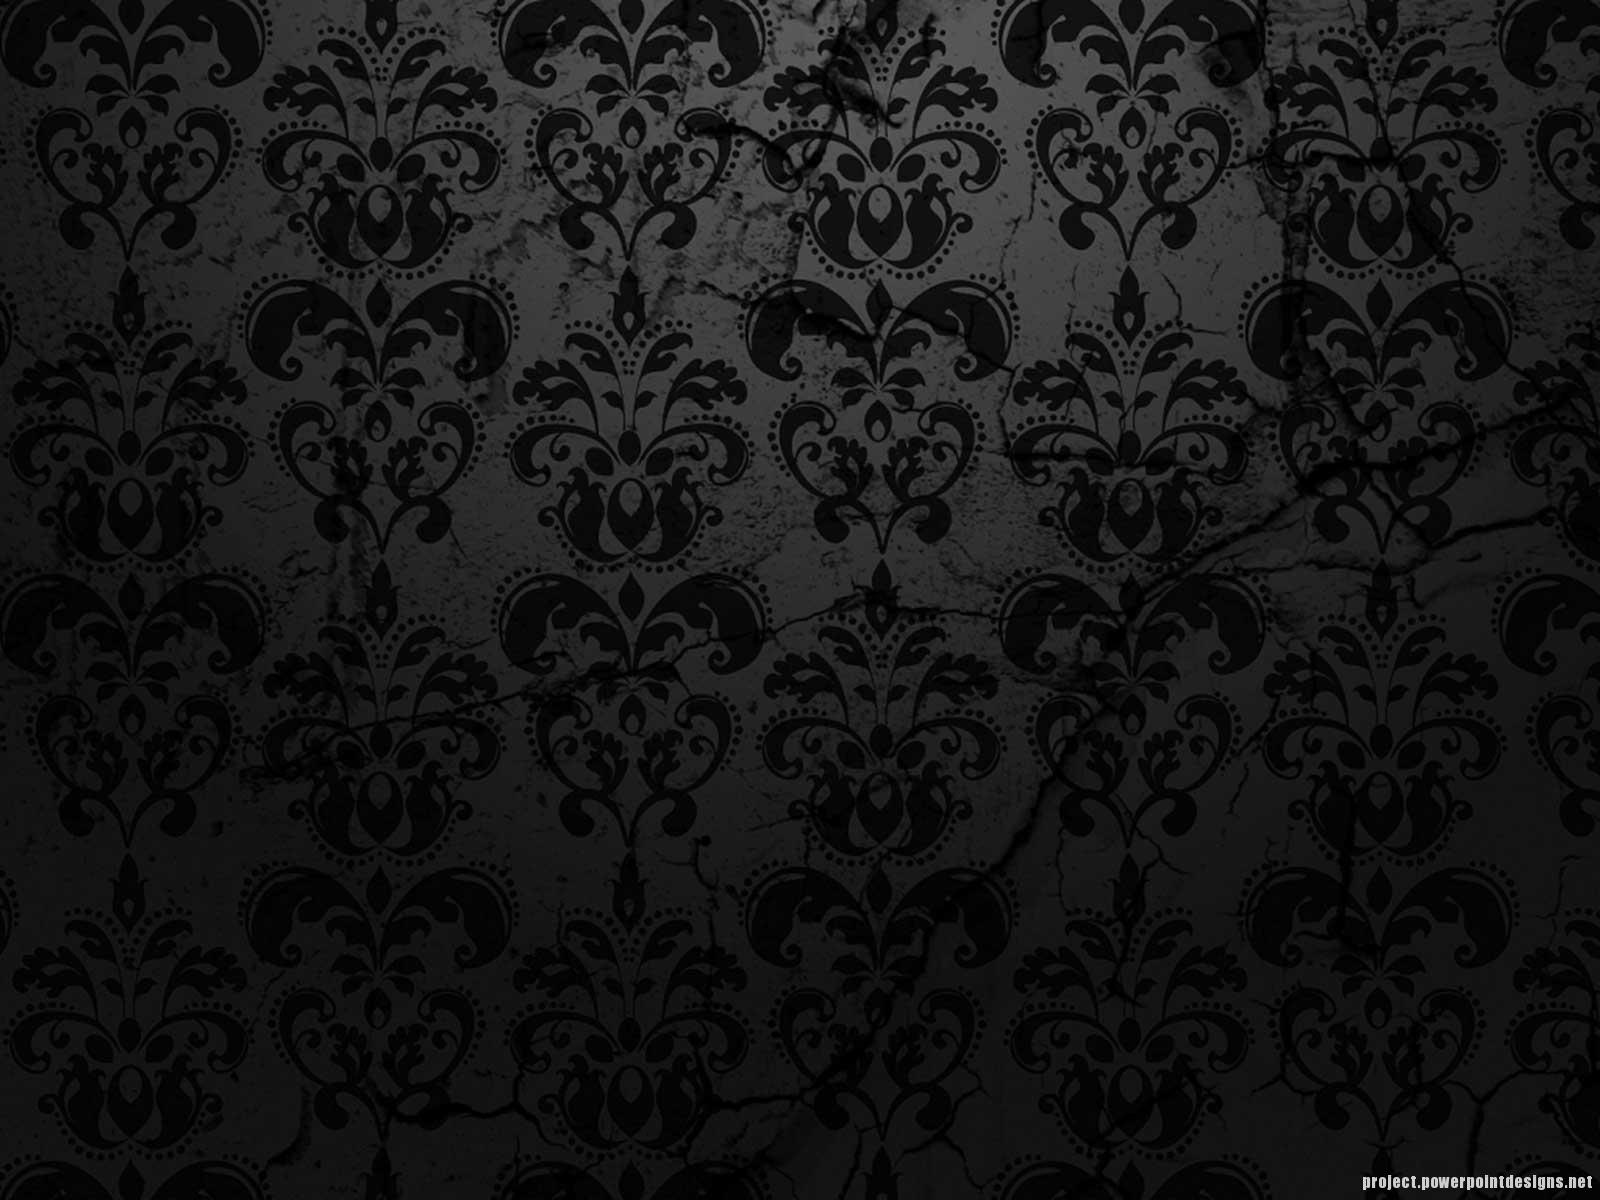 black-batik-background-powerpoint